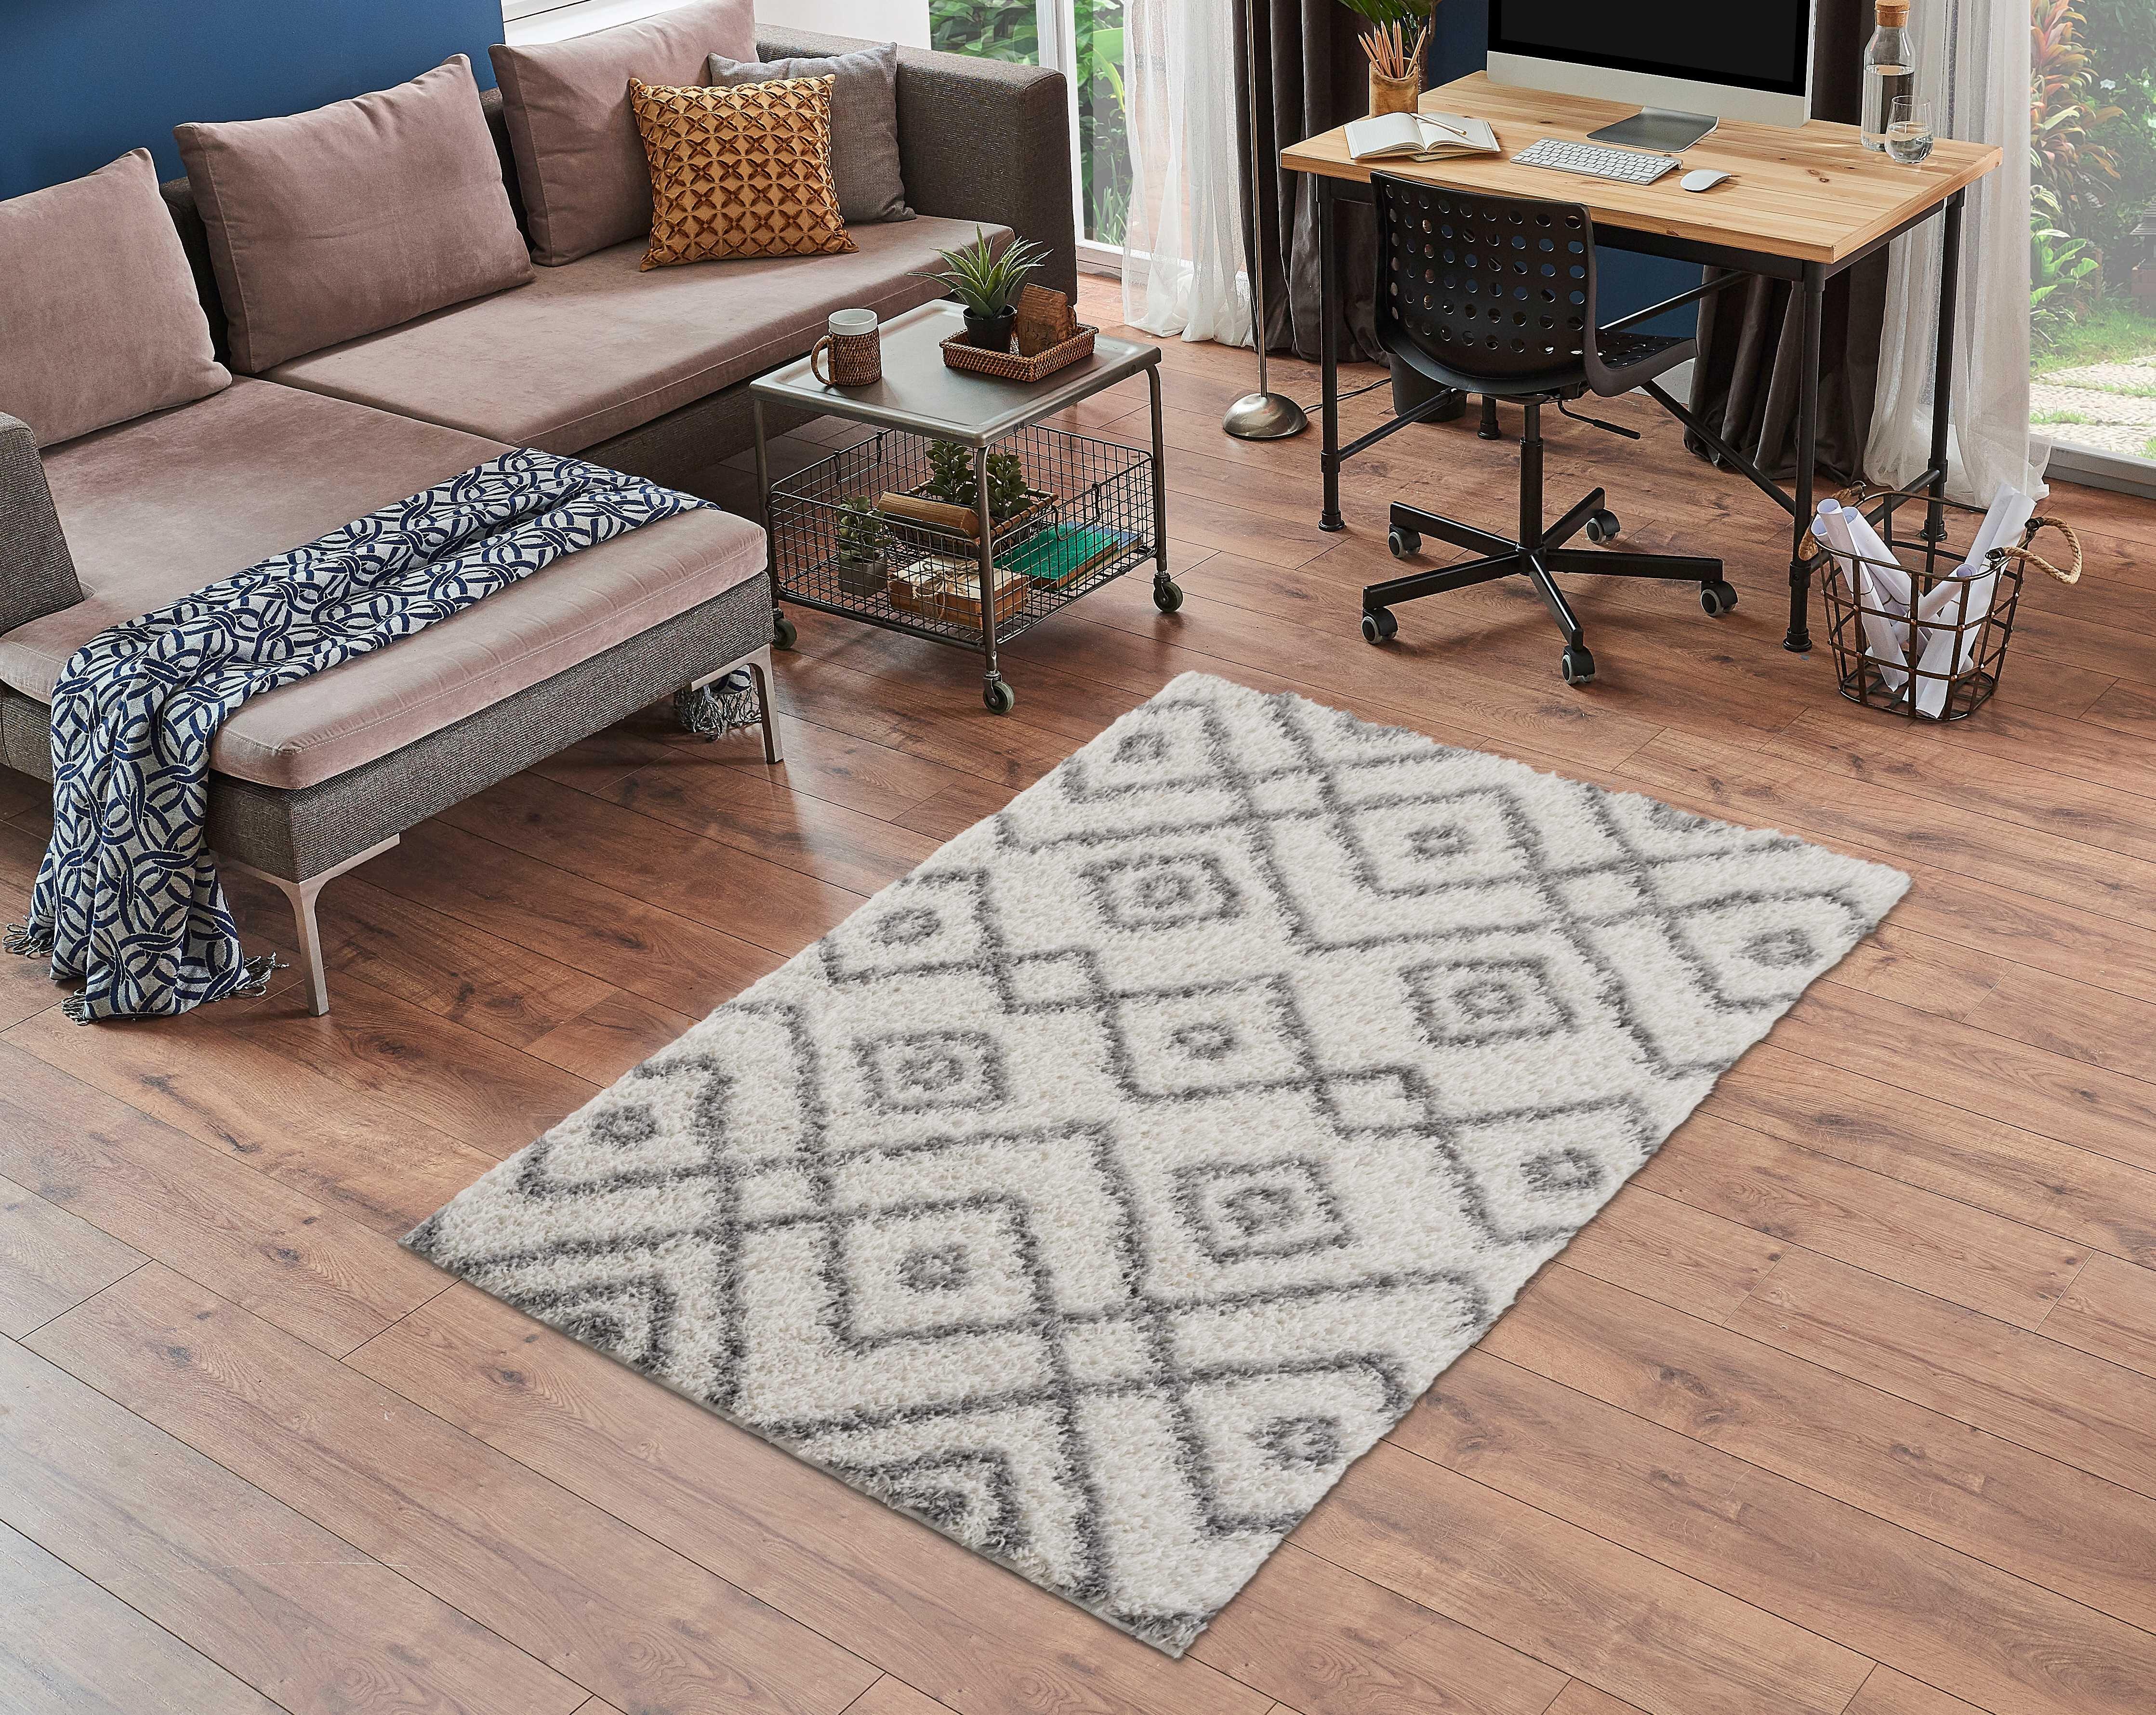 Foundry Select Huggard Geometric White Gray Area Rug Wayfair